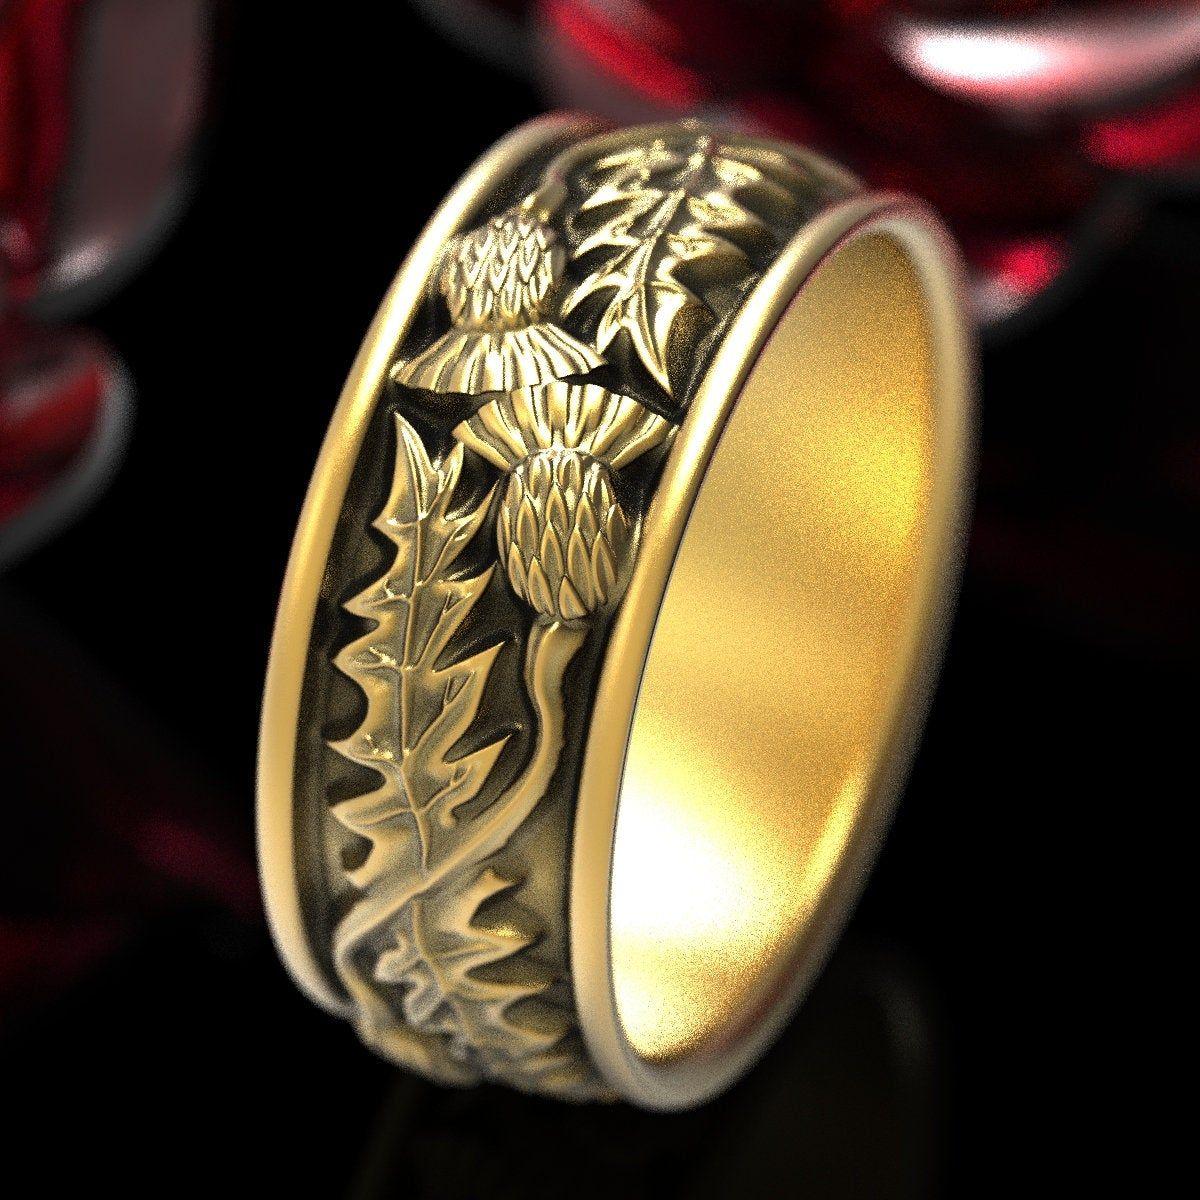 Gold Thistle Ring, Scottish Ring made in 10K 14K or 18K